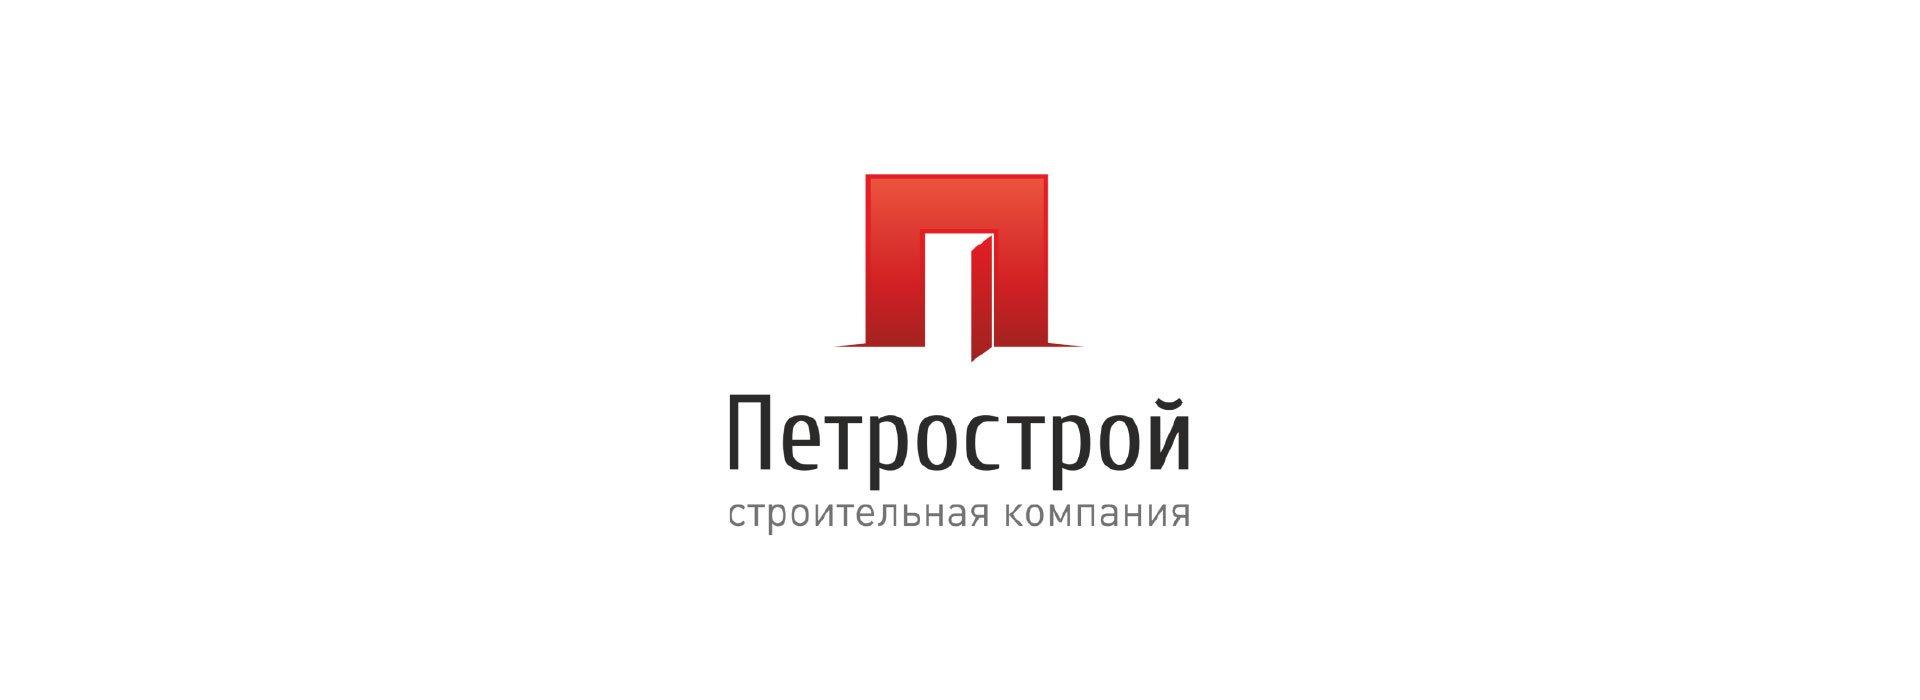 Petrostroy-01